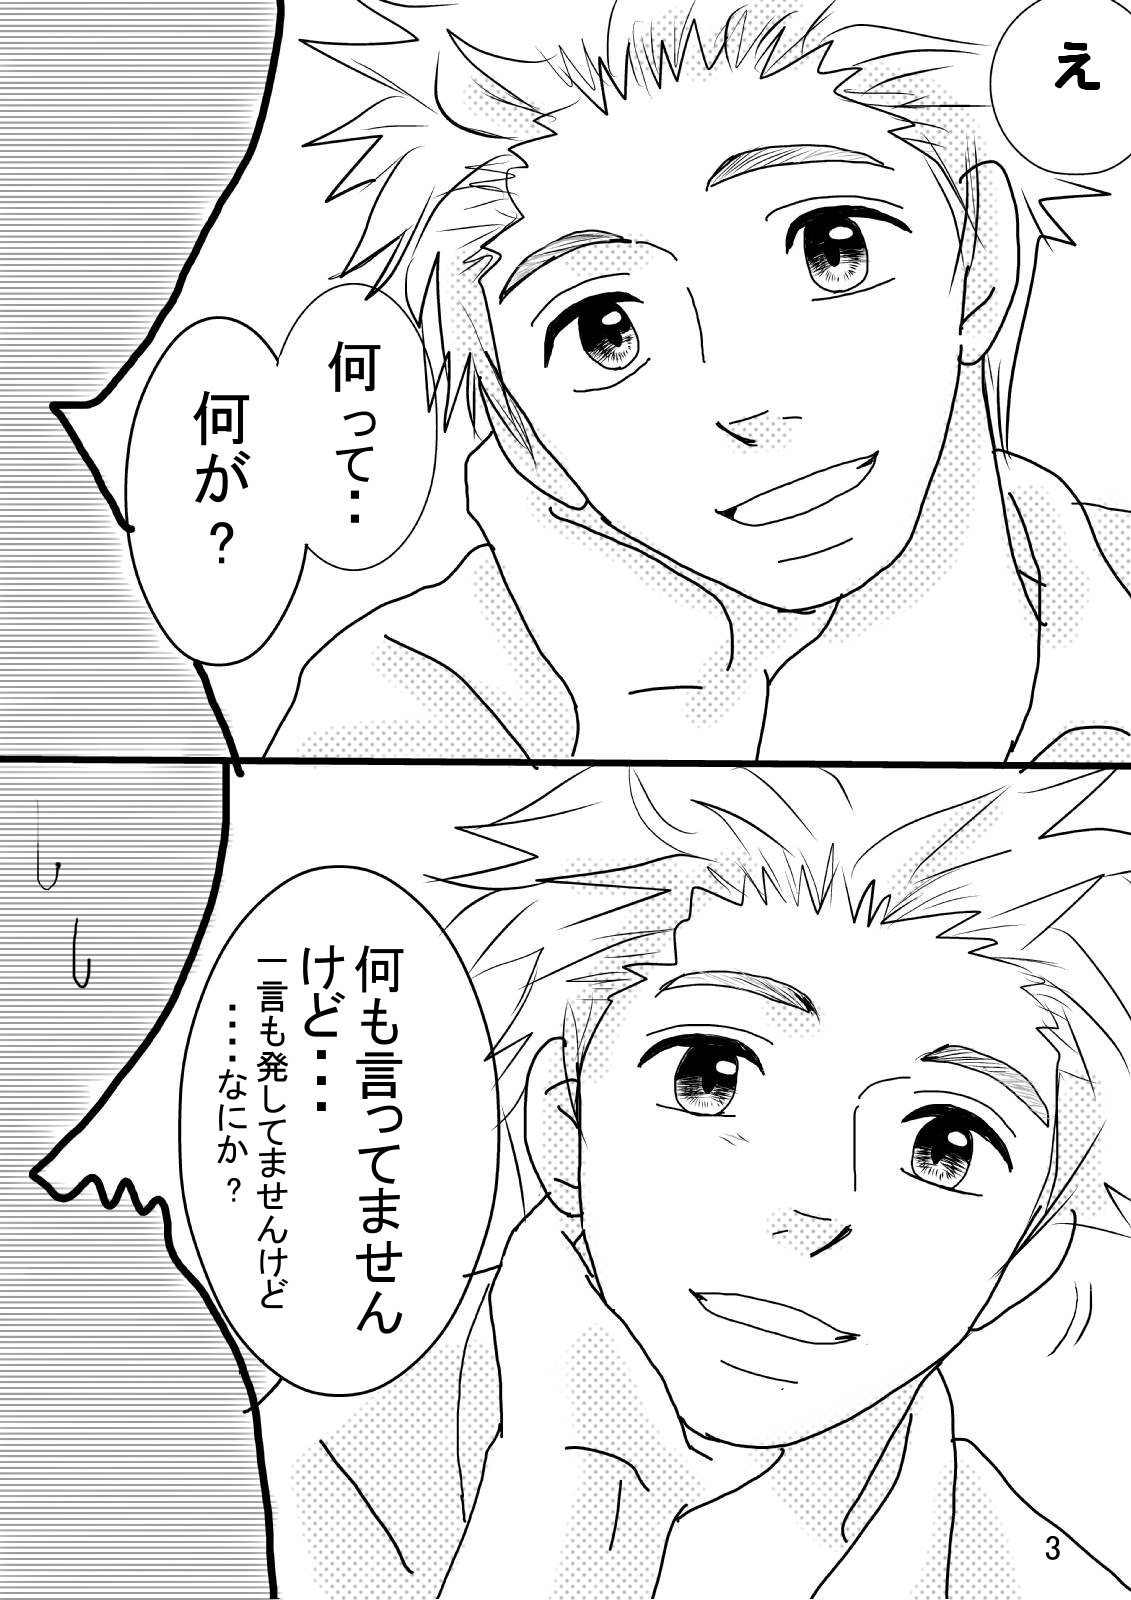 3psd (2).JPG